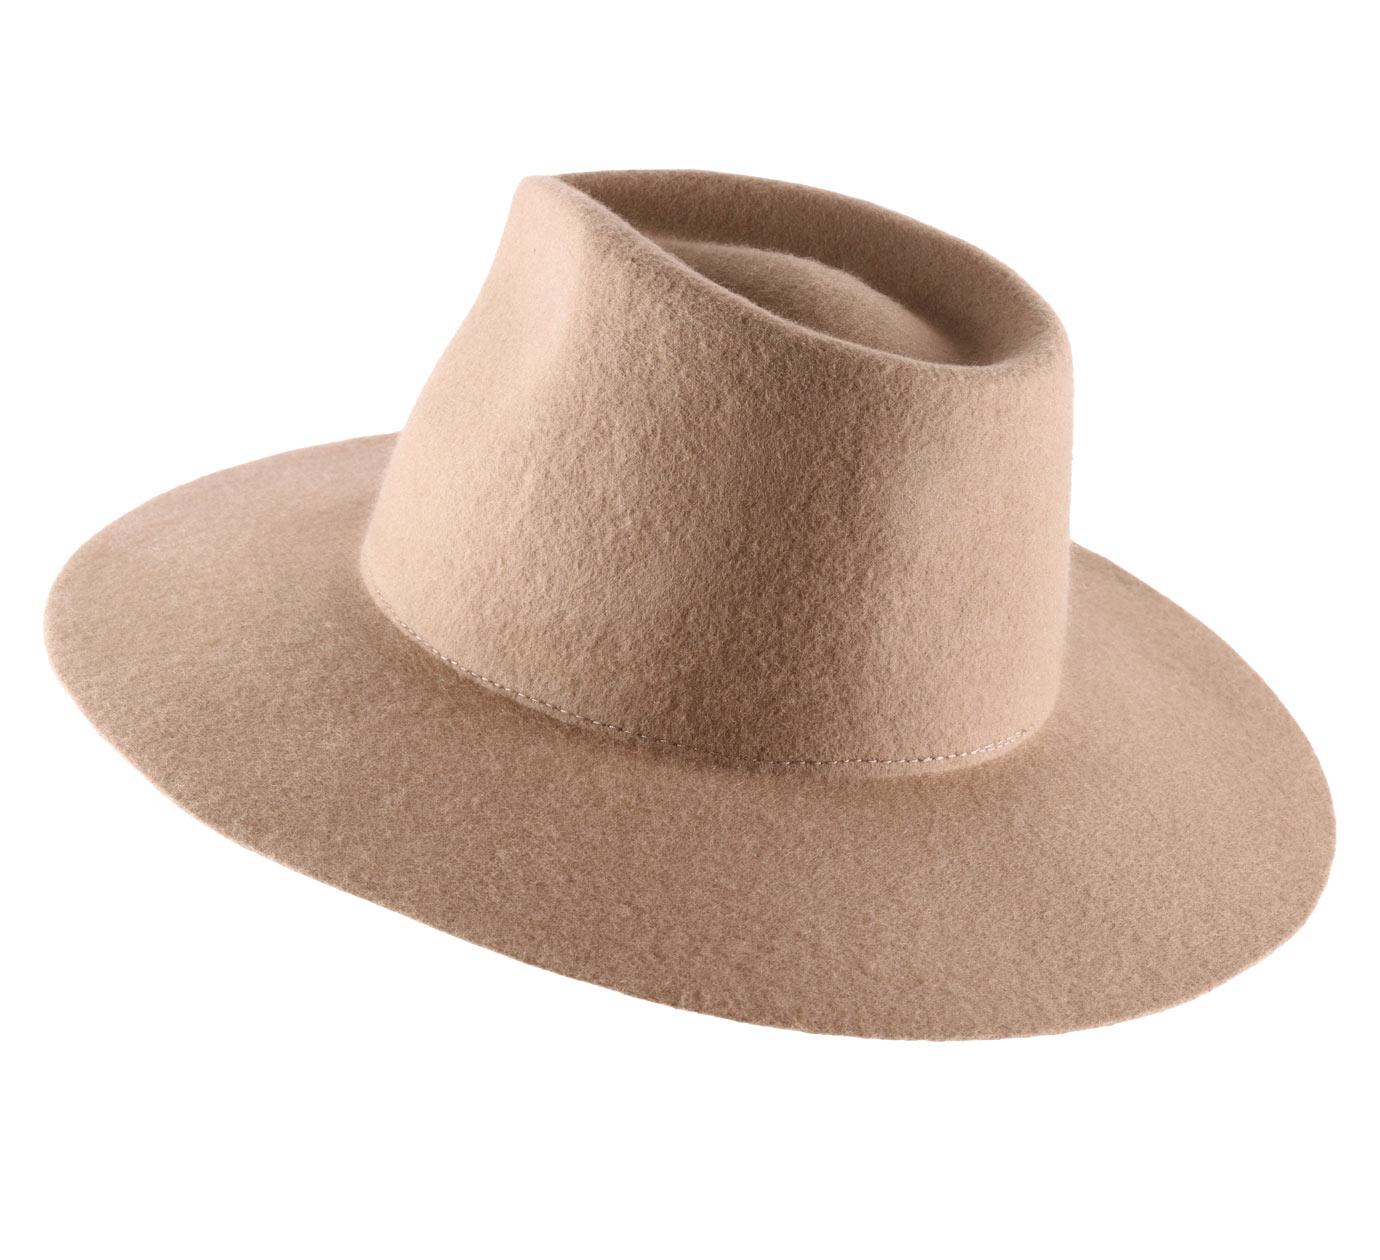 Classic Italy  Men/'s Sguarnito  Wool Felt Fedora Hat Water Repellent  Wide Brim